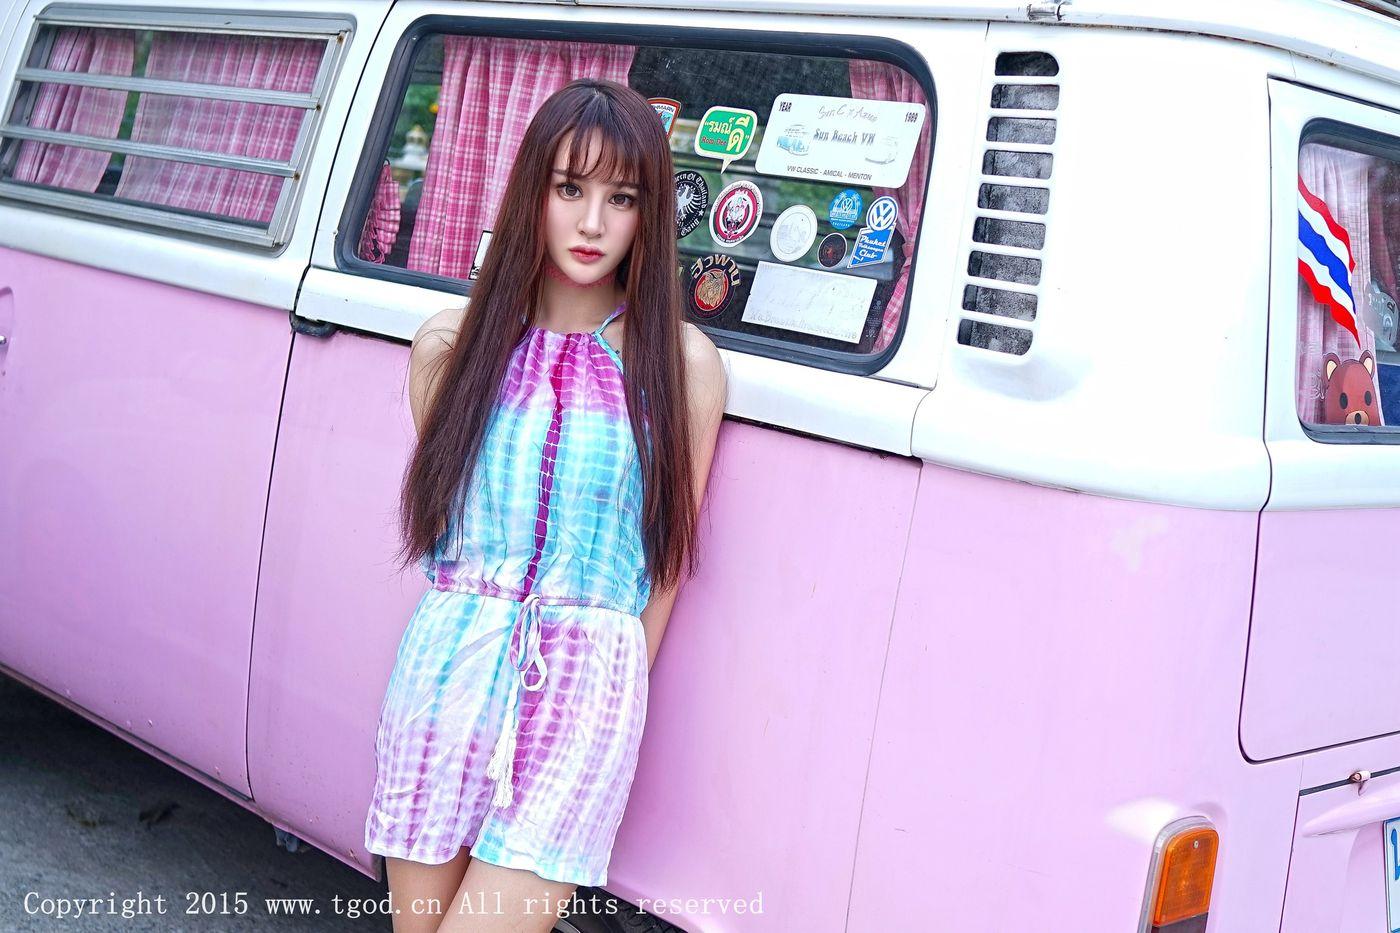 [TGOD推女神] 美女模特Cheryl青树完美身材普吉岛清新街拍第一刊